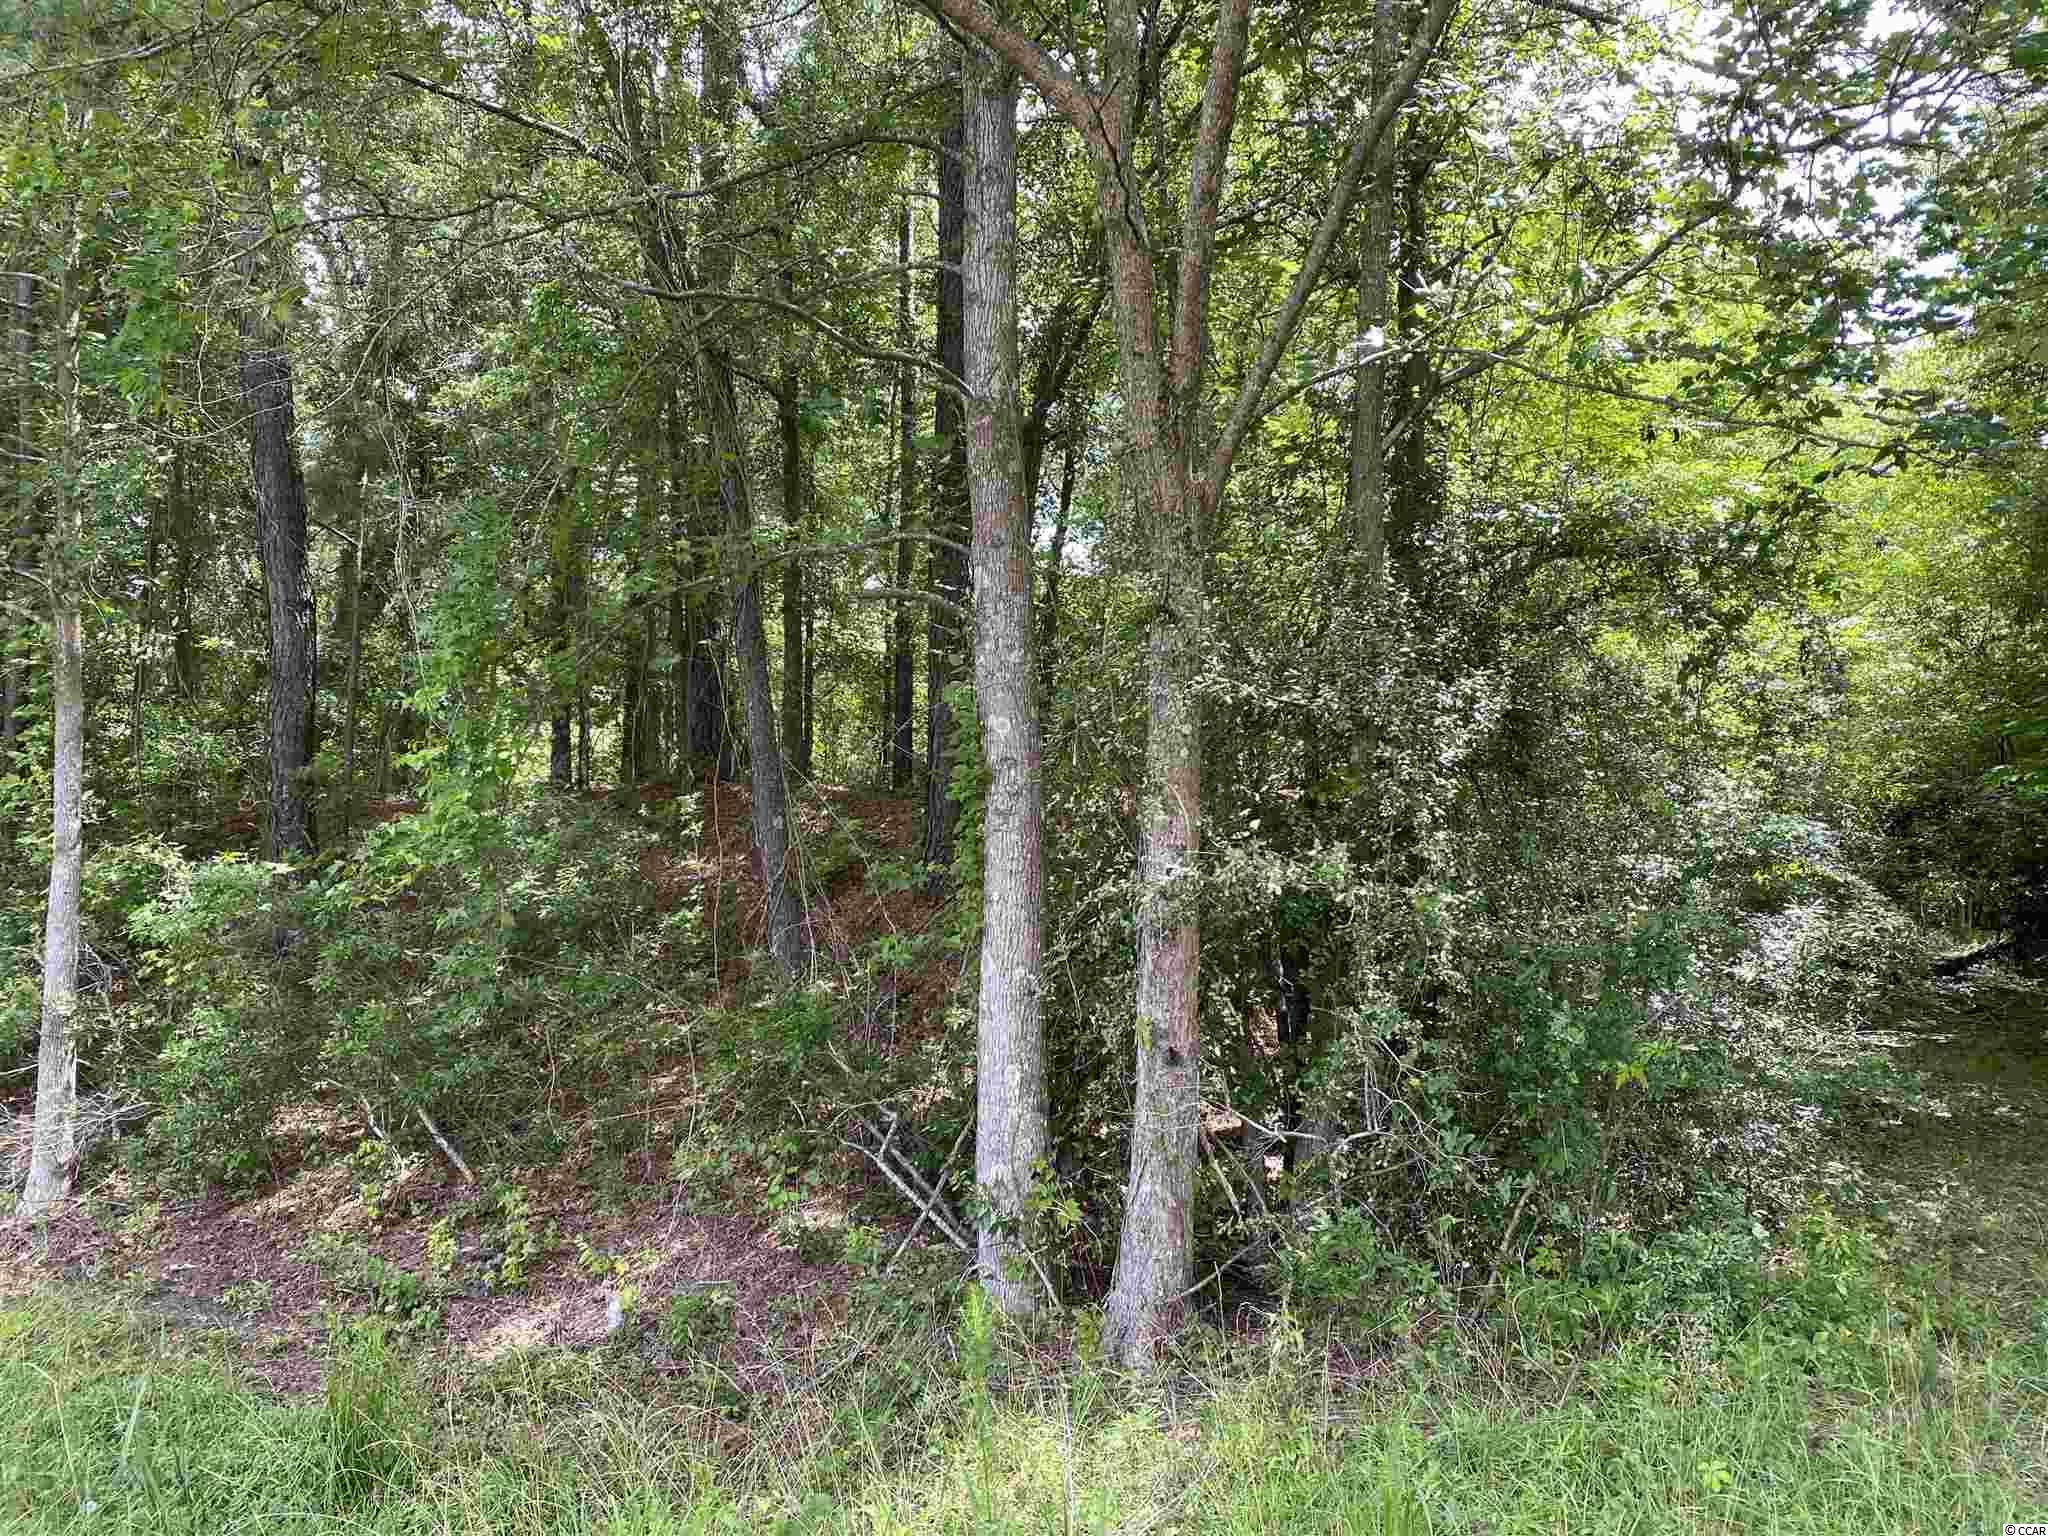 Tbd Highway 378 Property Photo 15